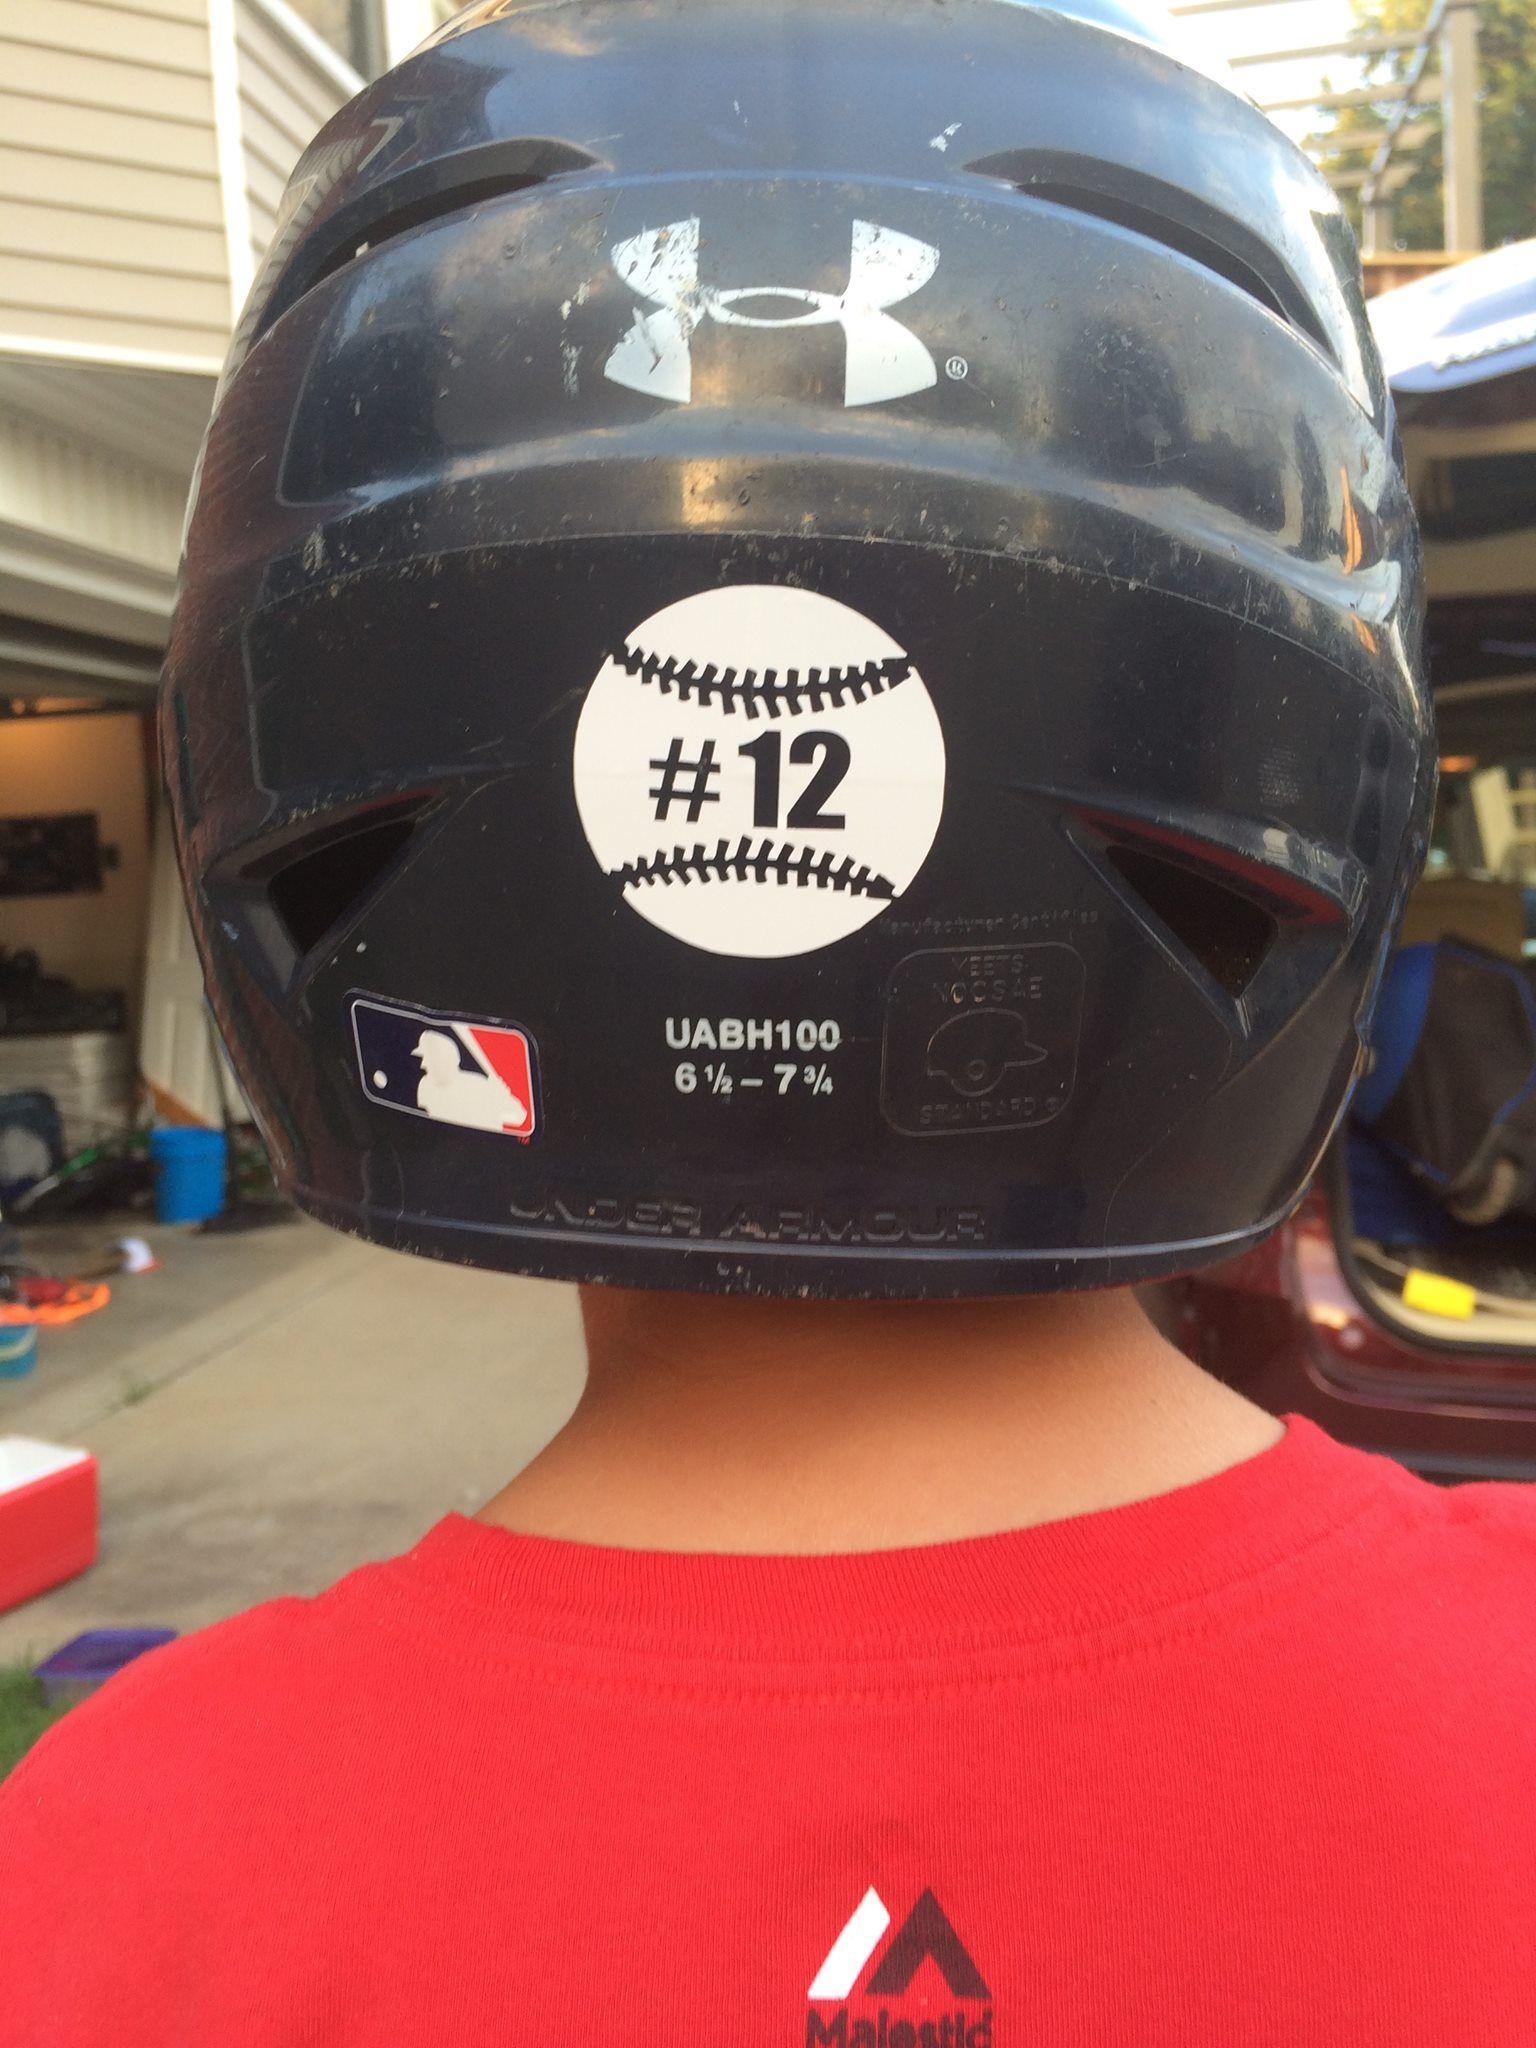 Helmet numbers mycreatorshandsgmail com mets baseball baseball shoes baseball numbers